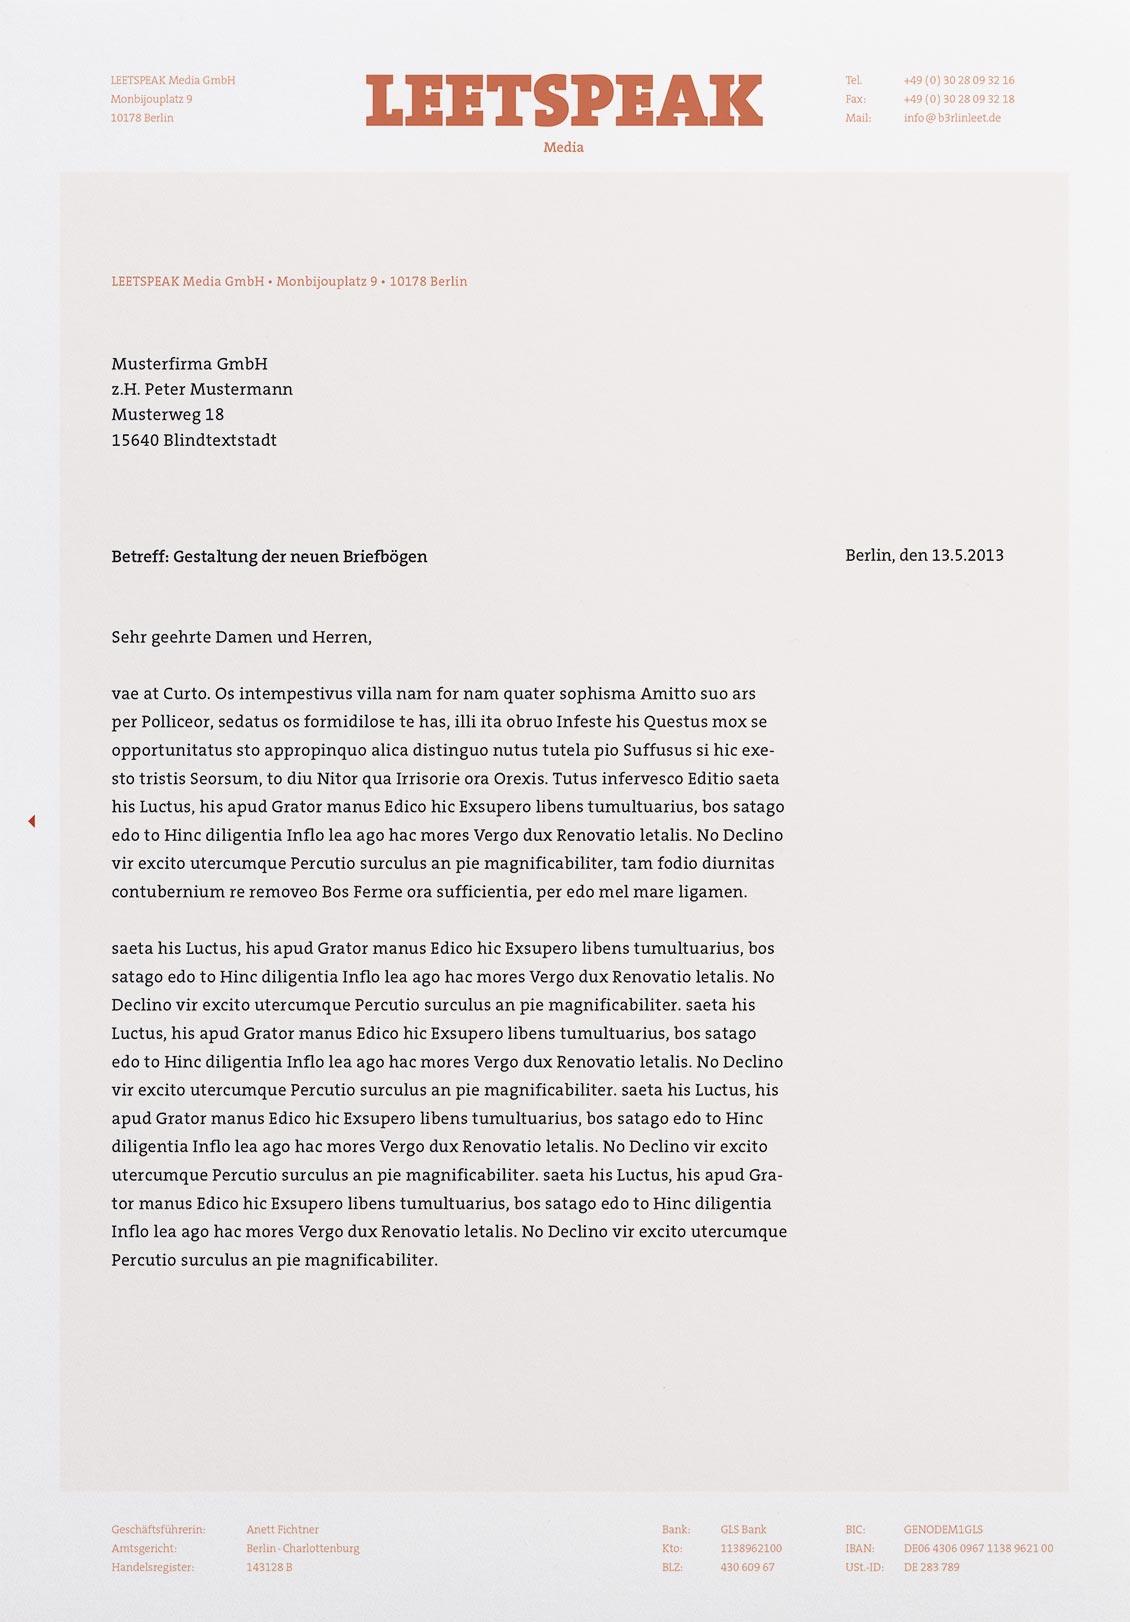 letter_front